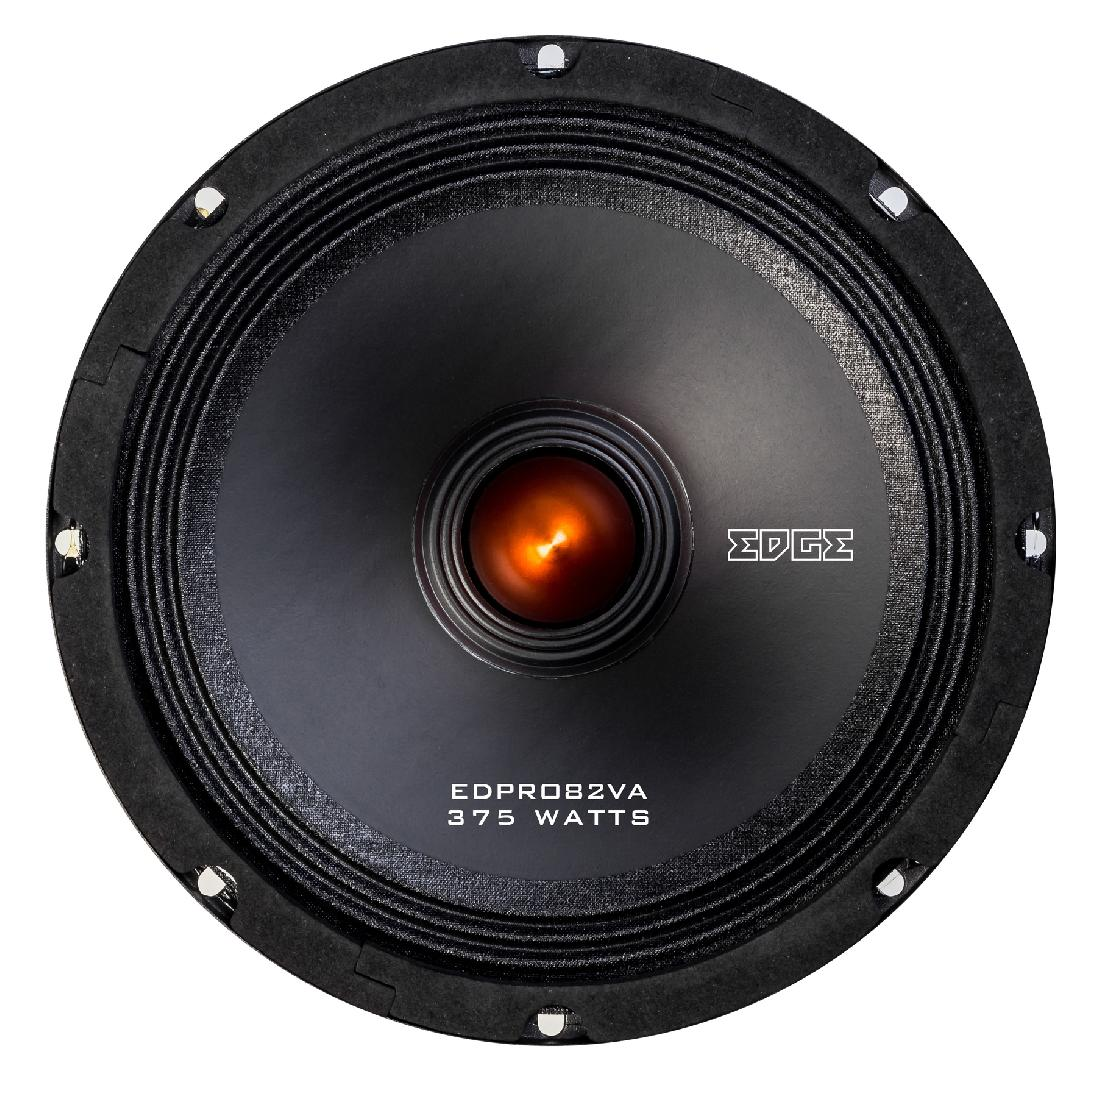 Edge ED-PRO82VA-E4